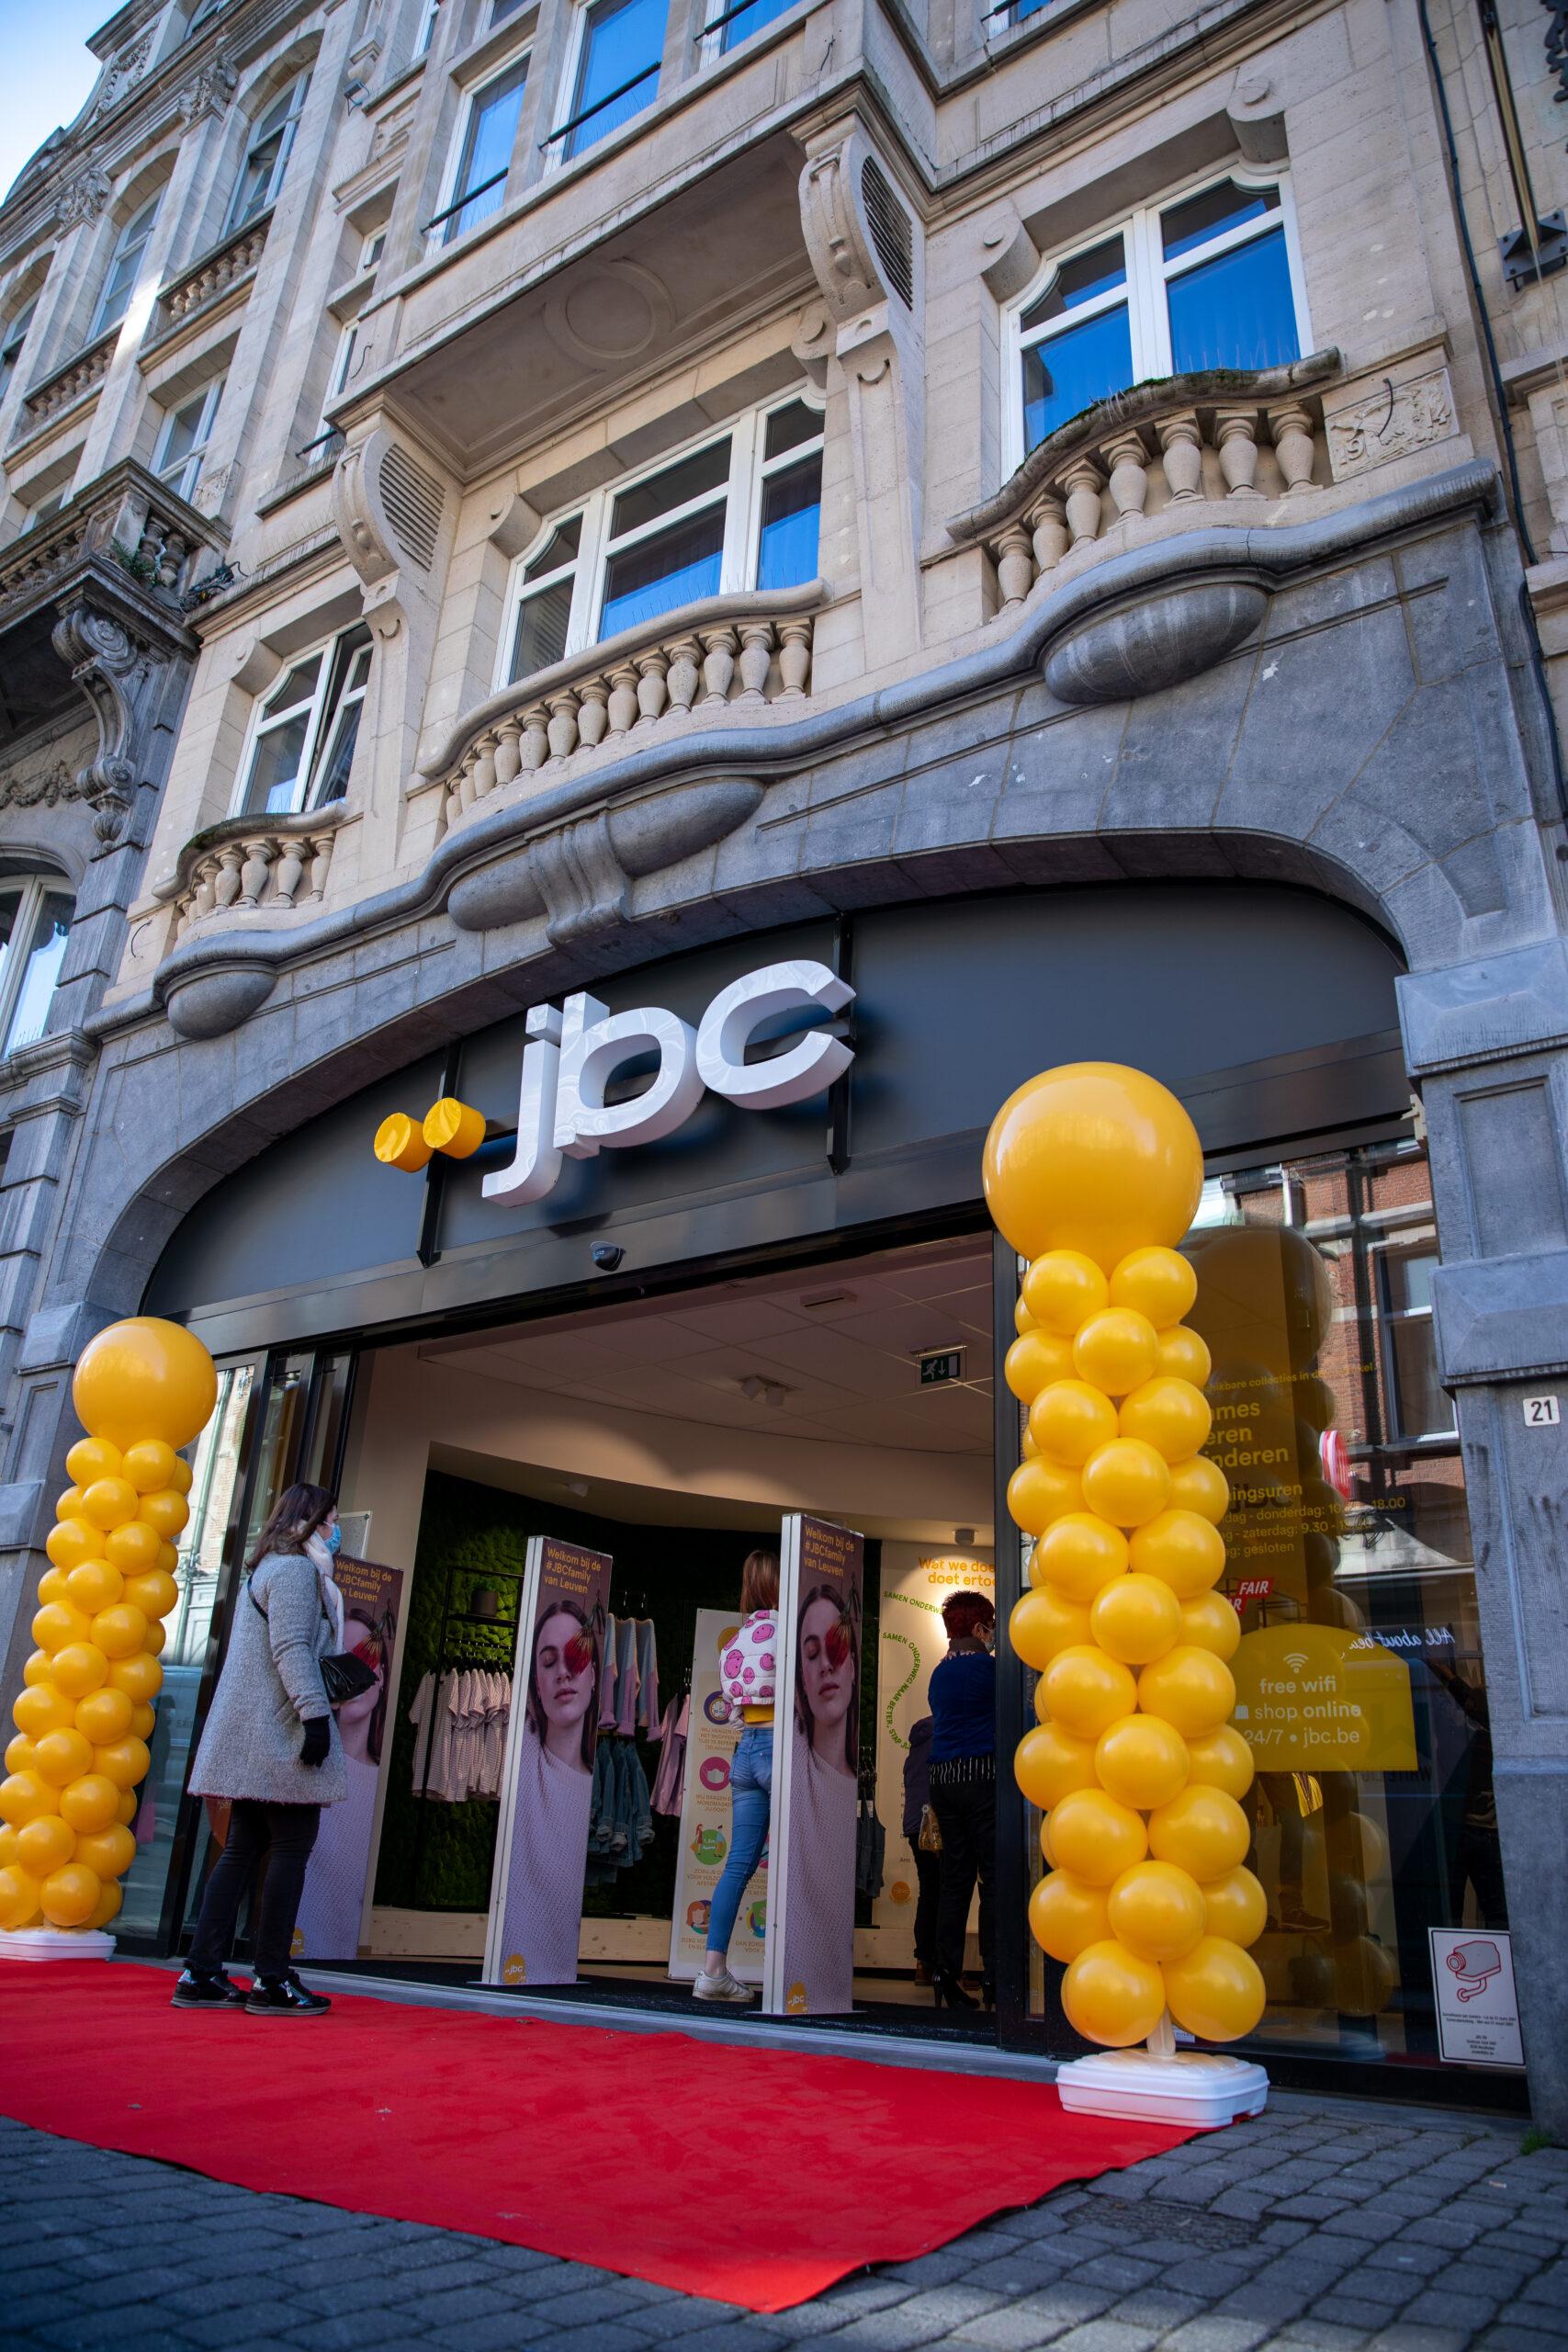 JBC opening